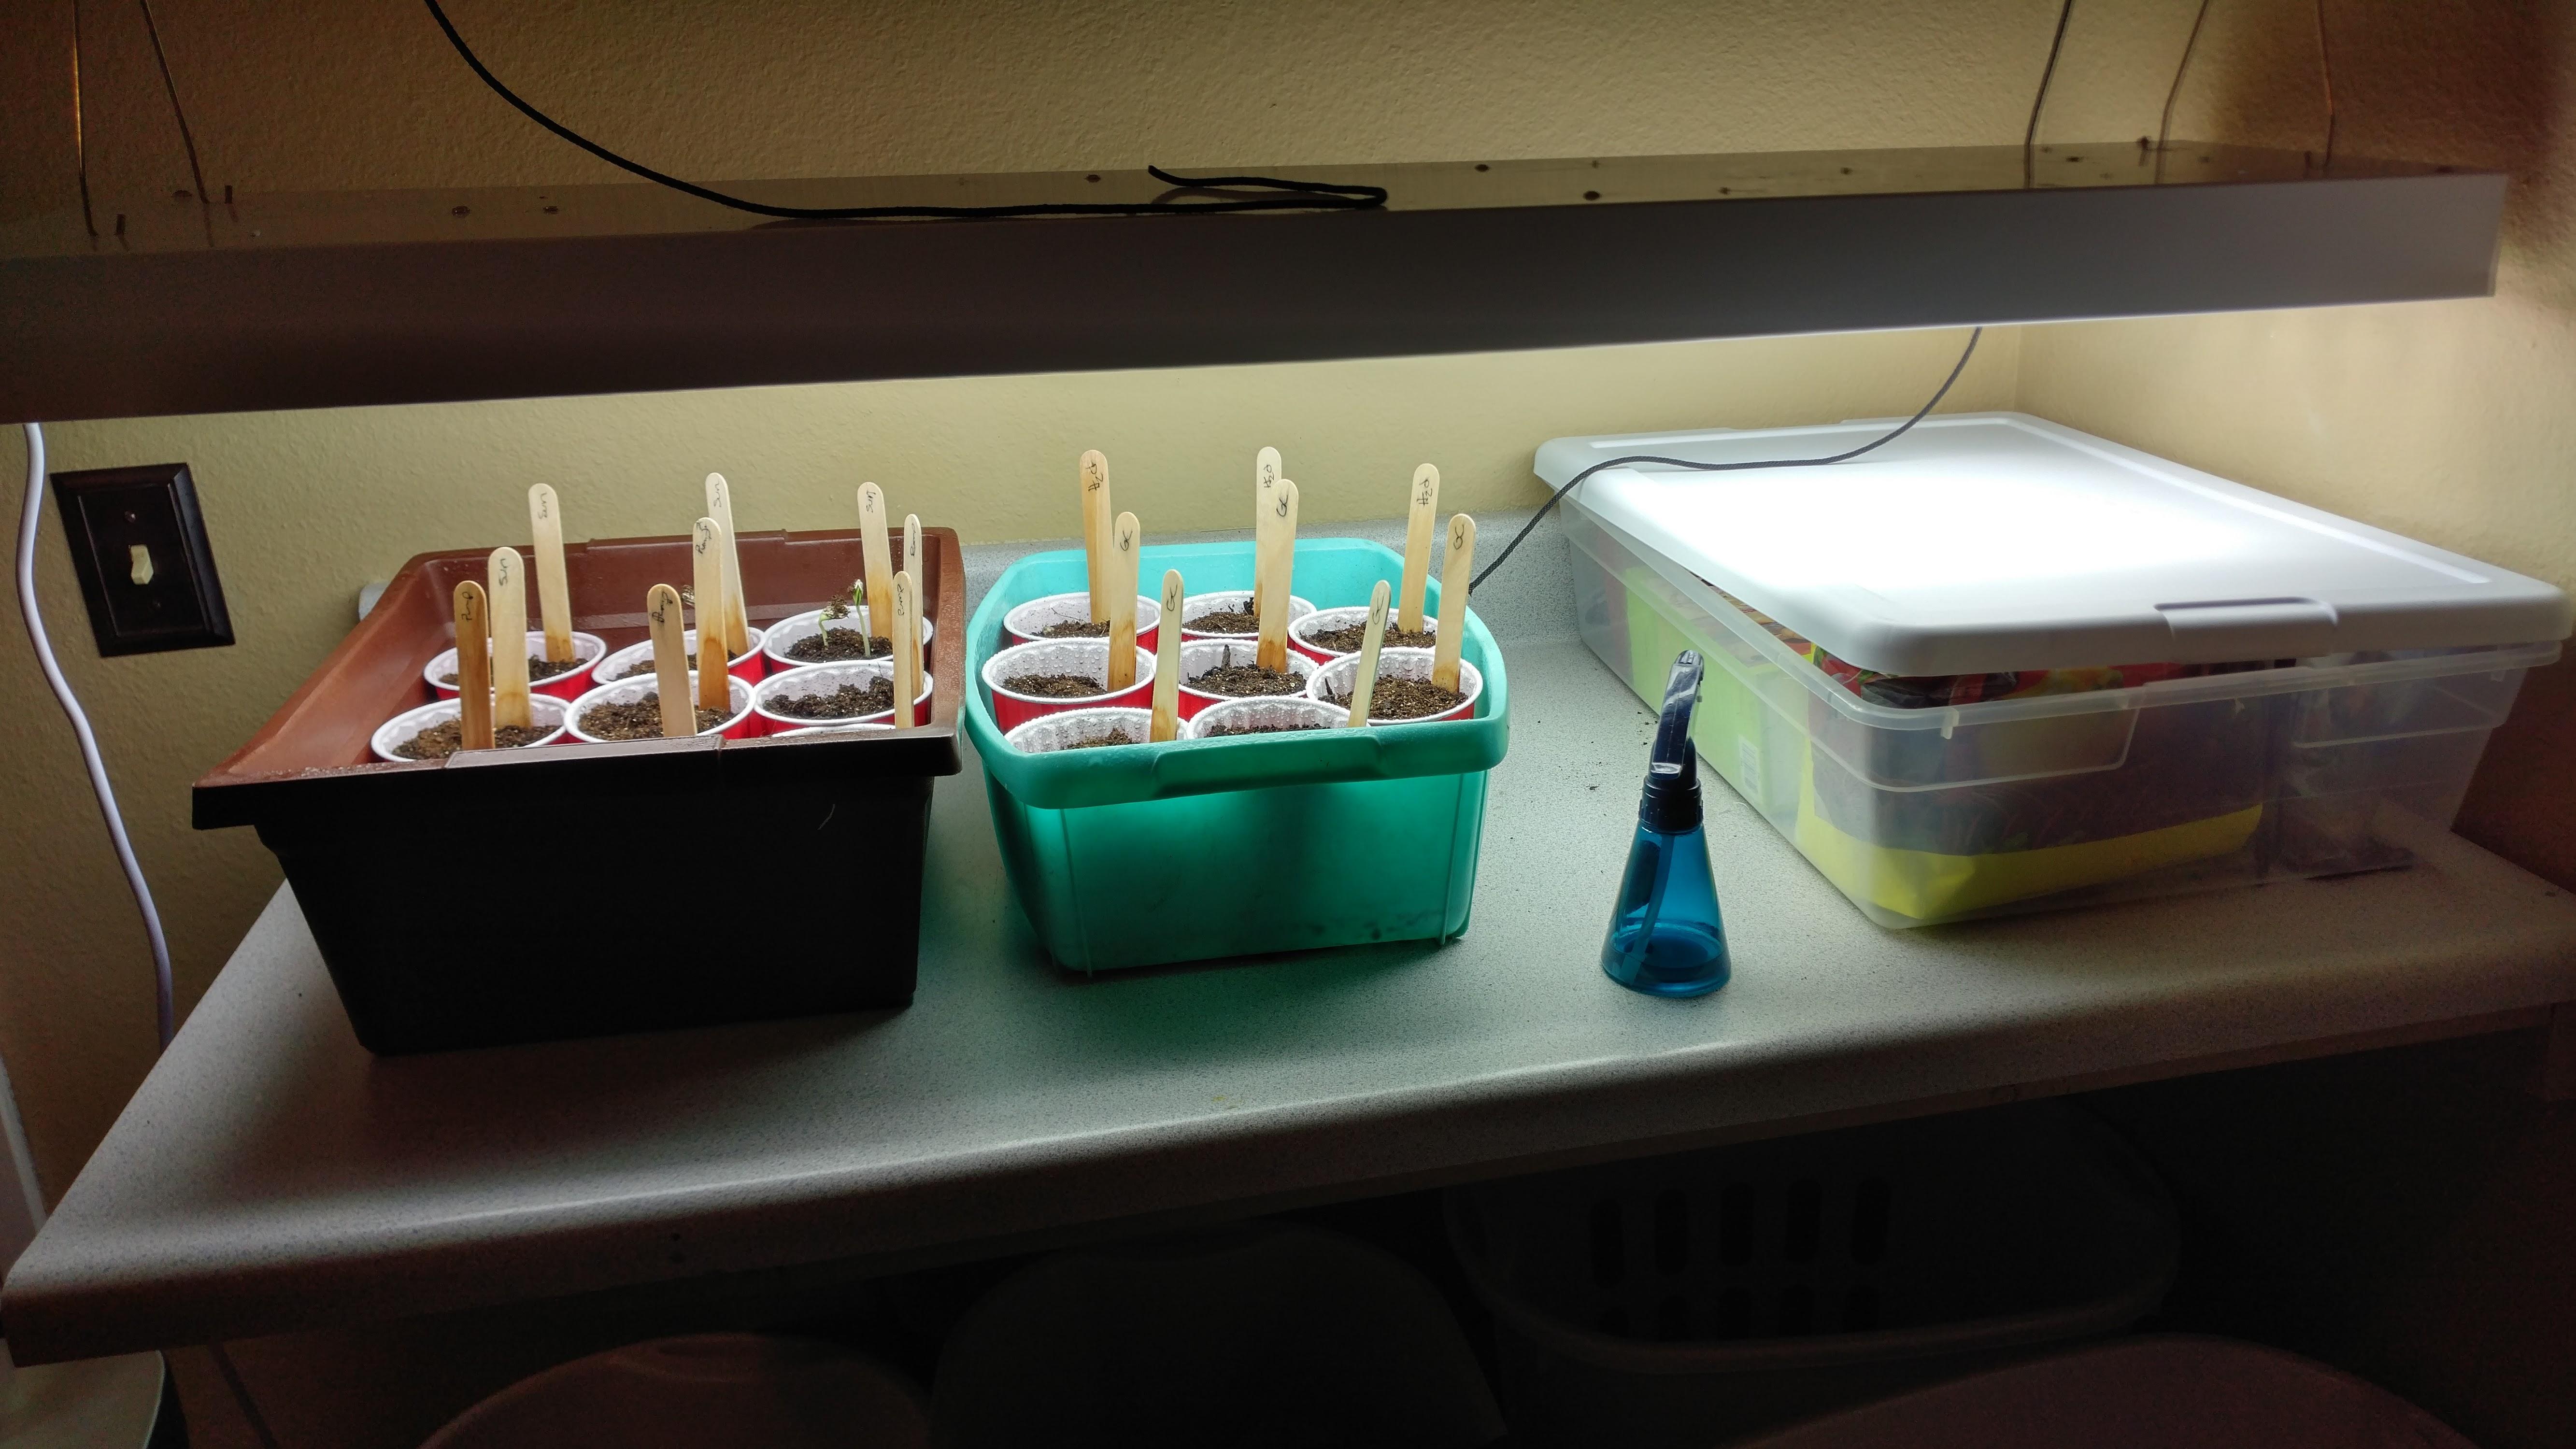 Indoor Seed Starting Resources